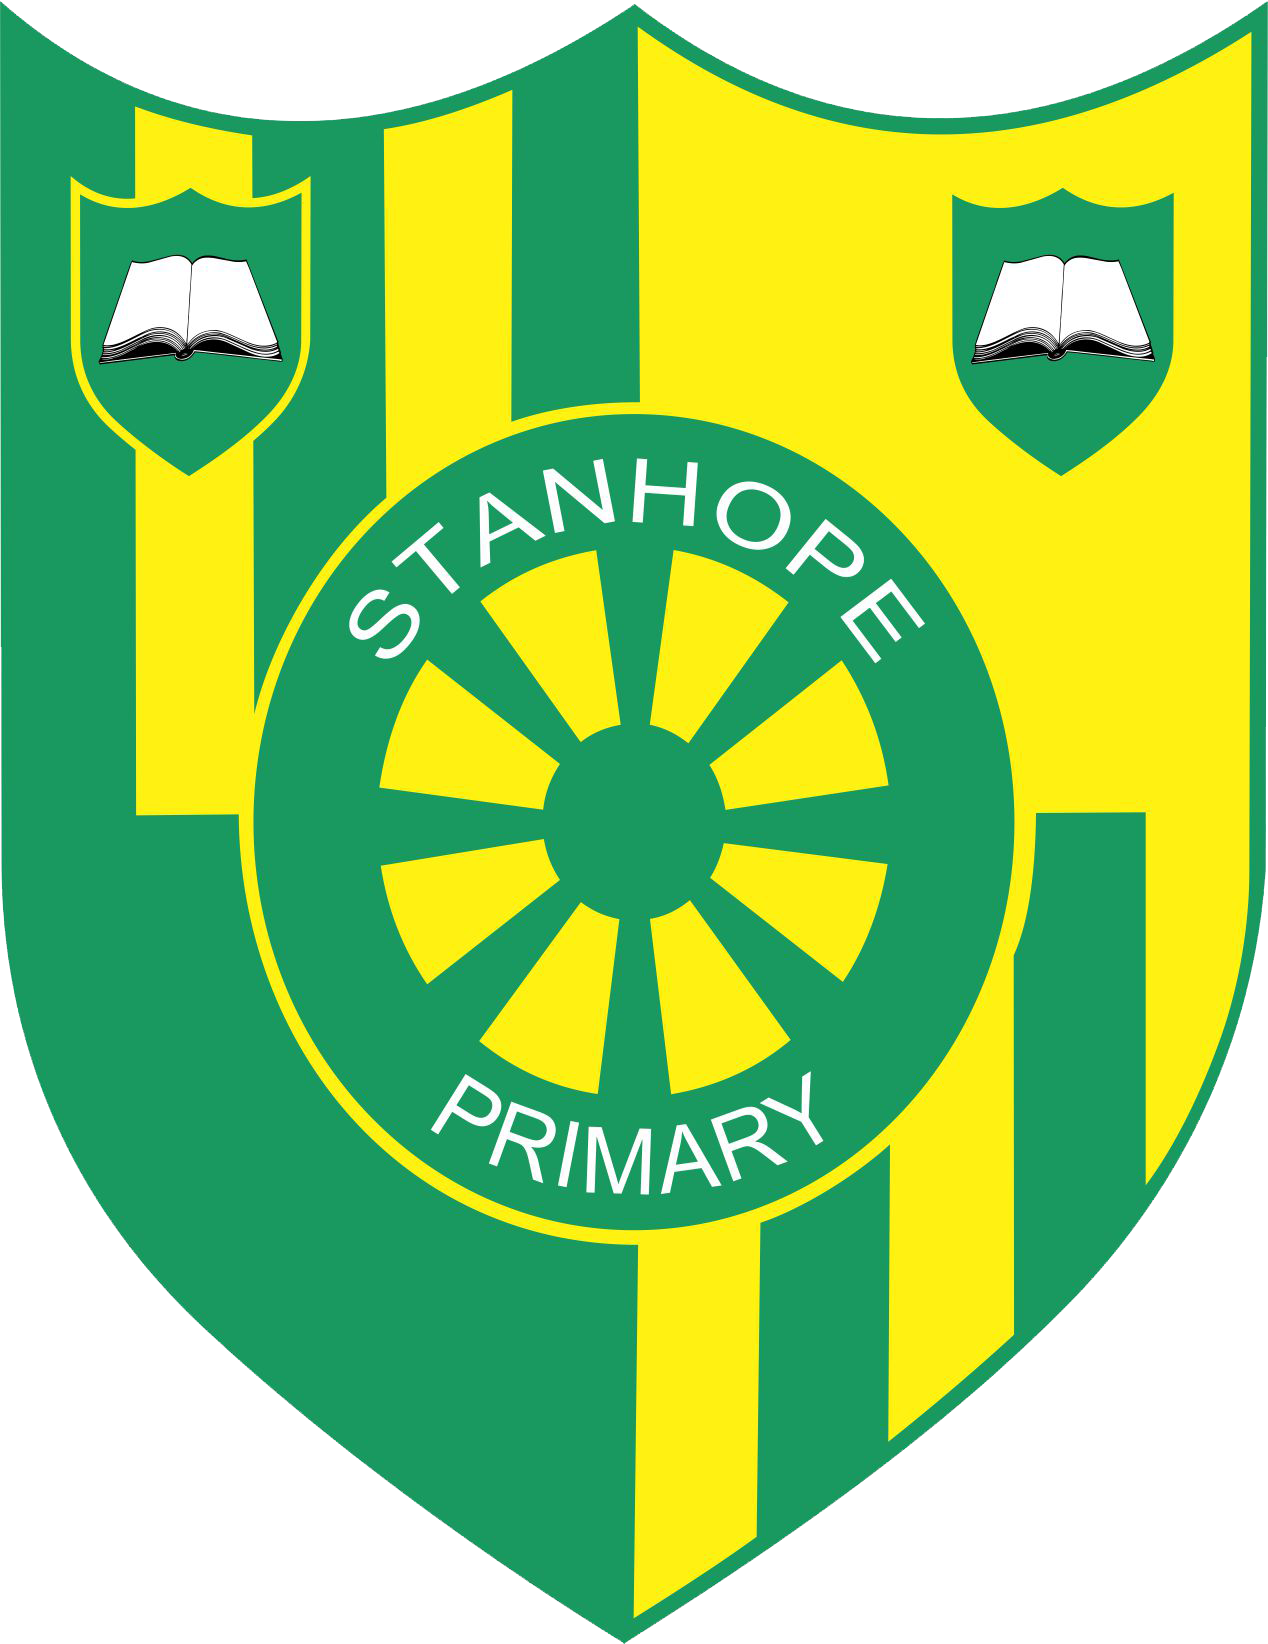 Stanhope Primary School Logo